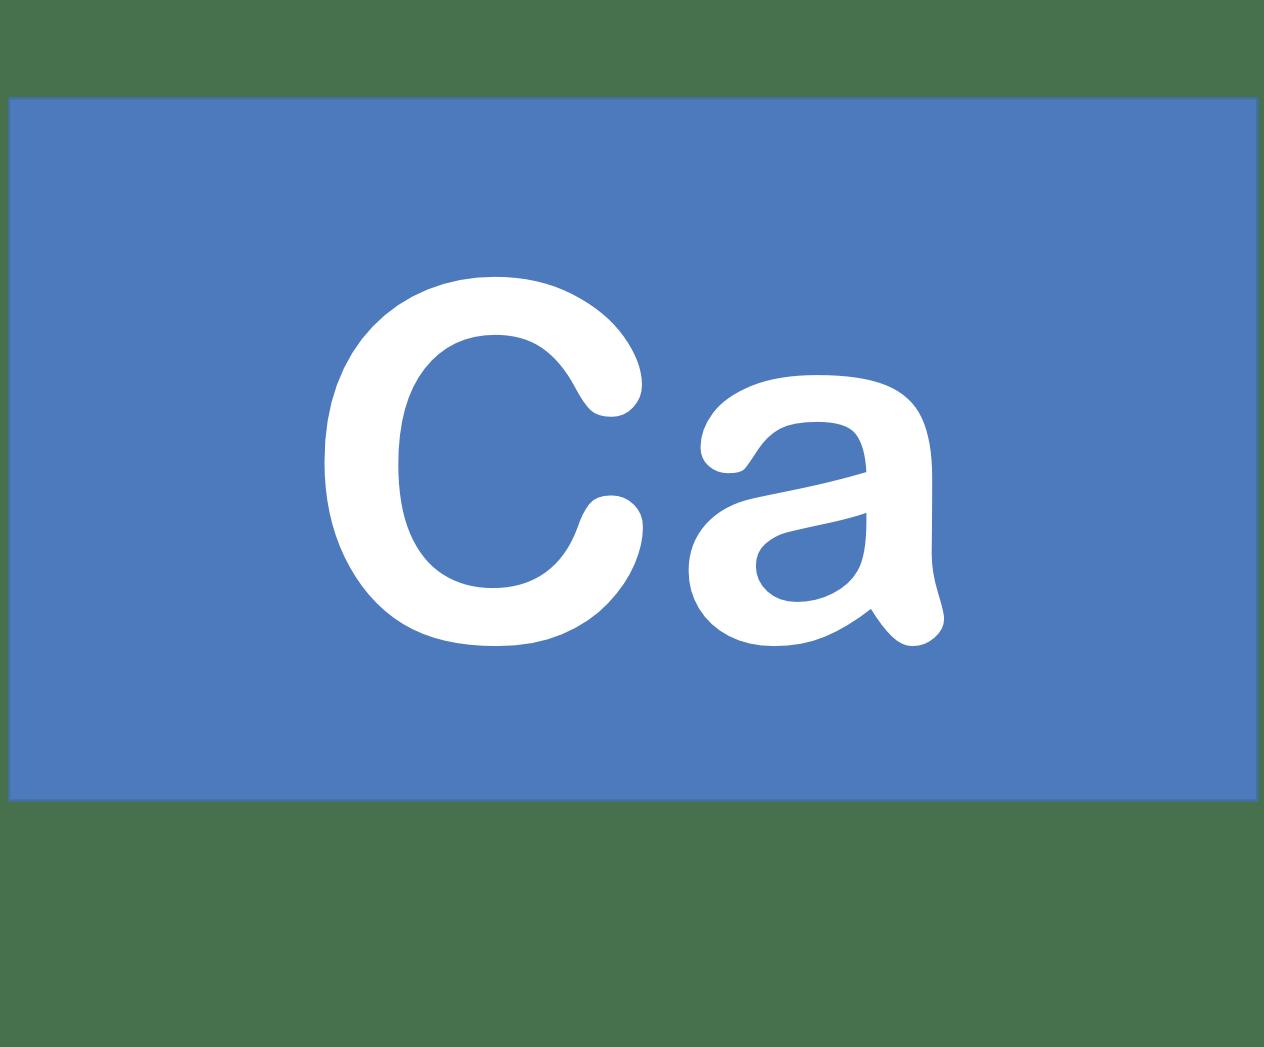 20 Ca カルシウム Calcium 元素 記号 周期表 化学 原子